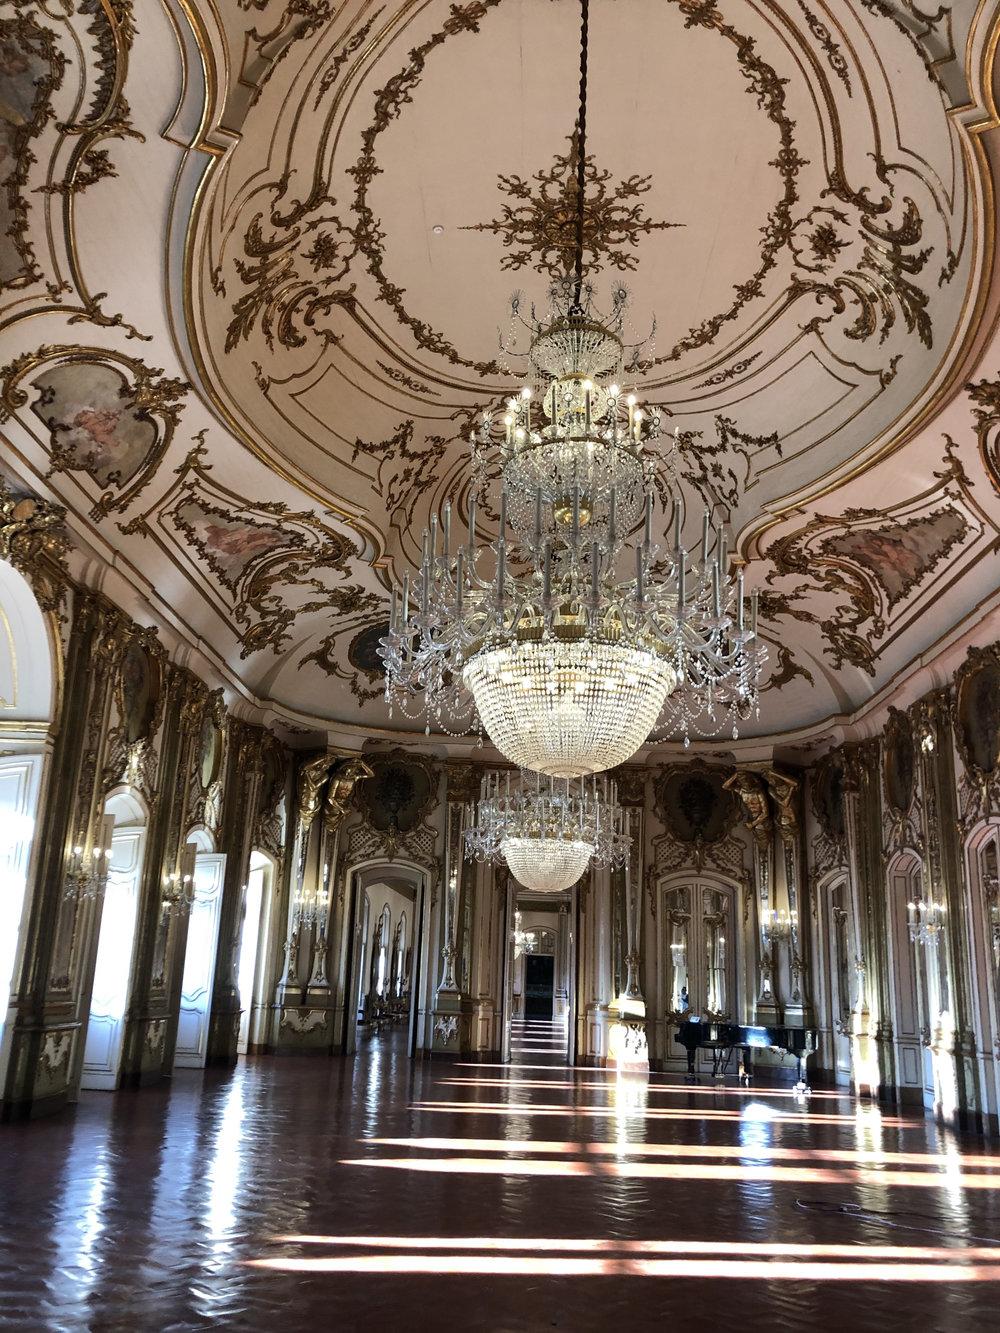 teri_lisbon_portugal_palaceofquelez_spiritedtable_photo02.jpg